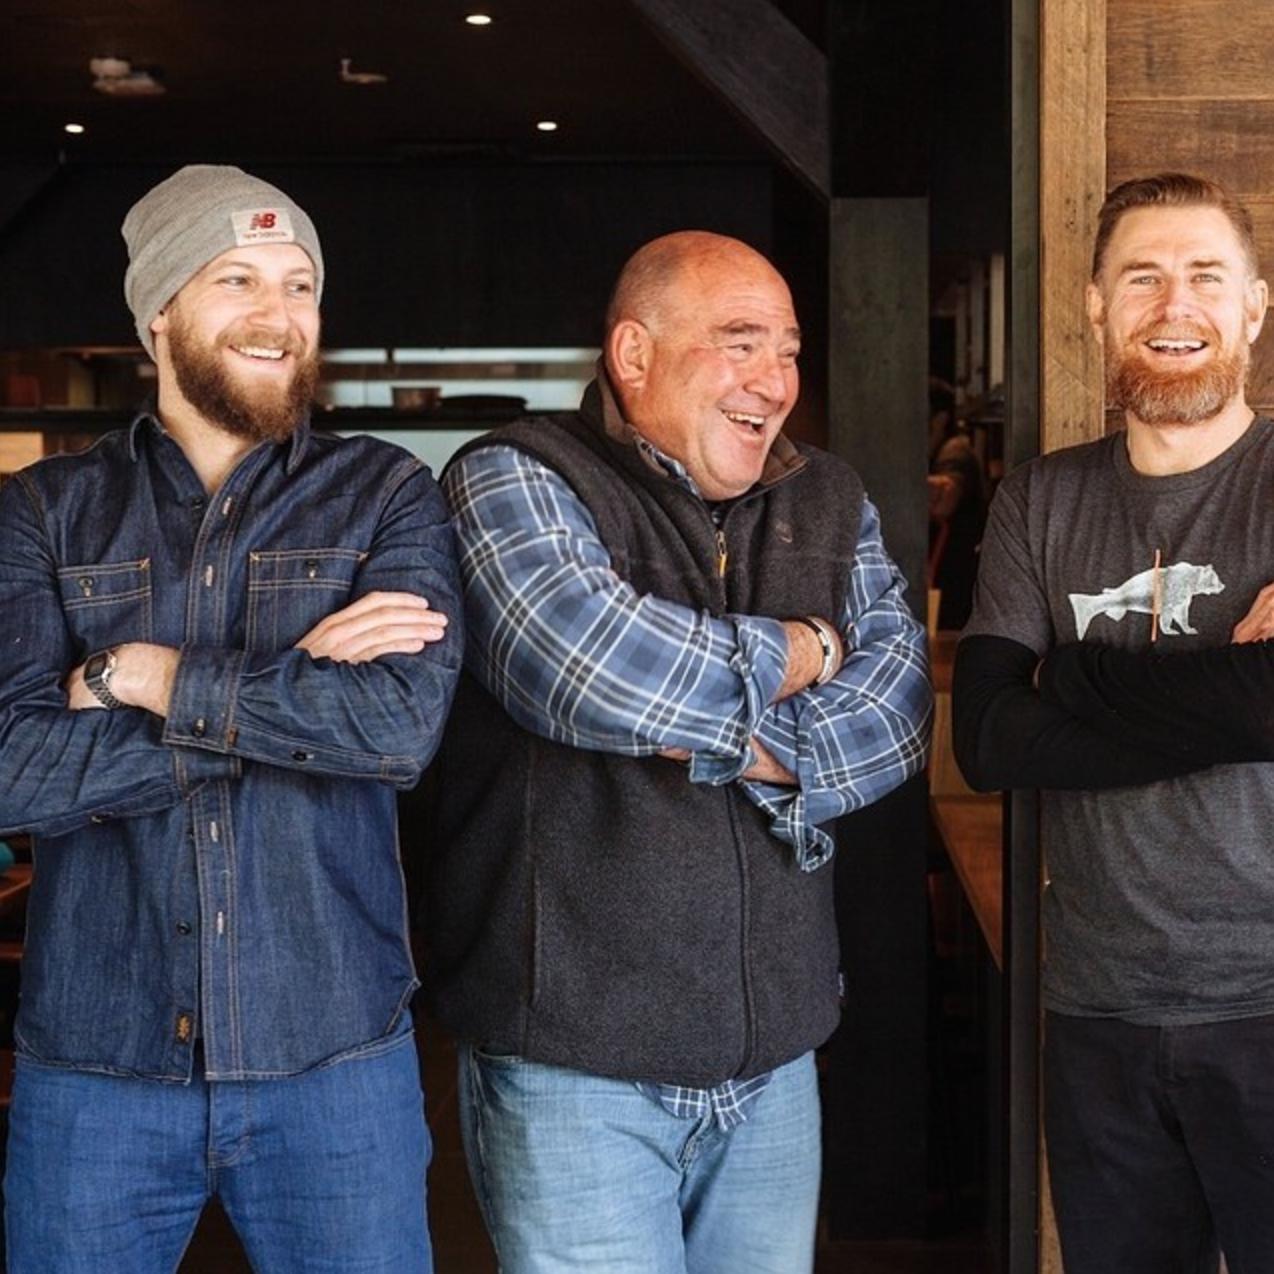 Joe, Joel and Mark from Salmon and Bear